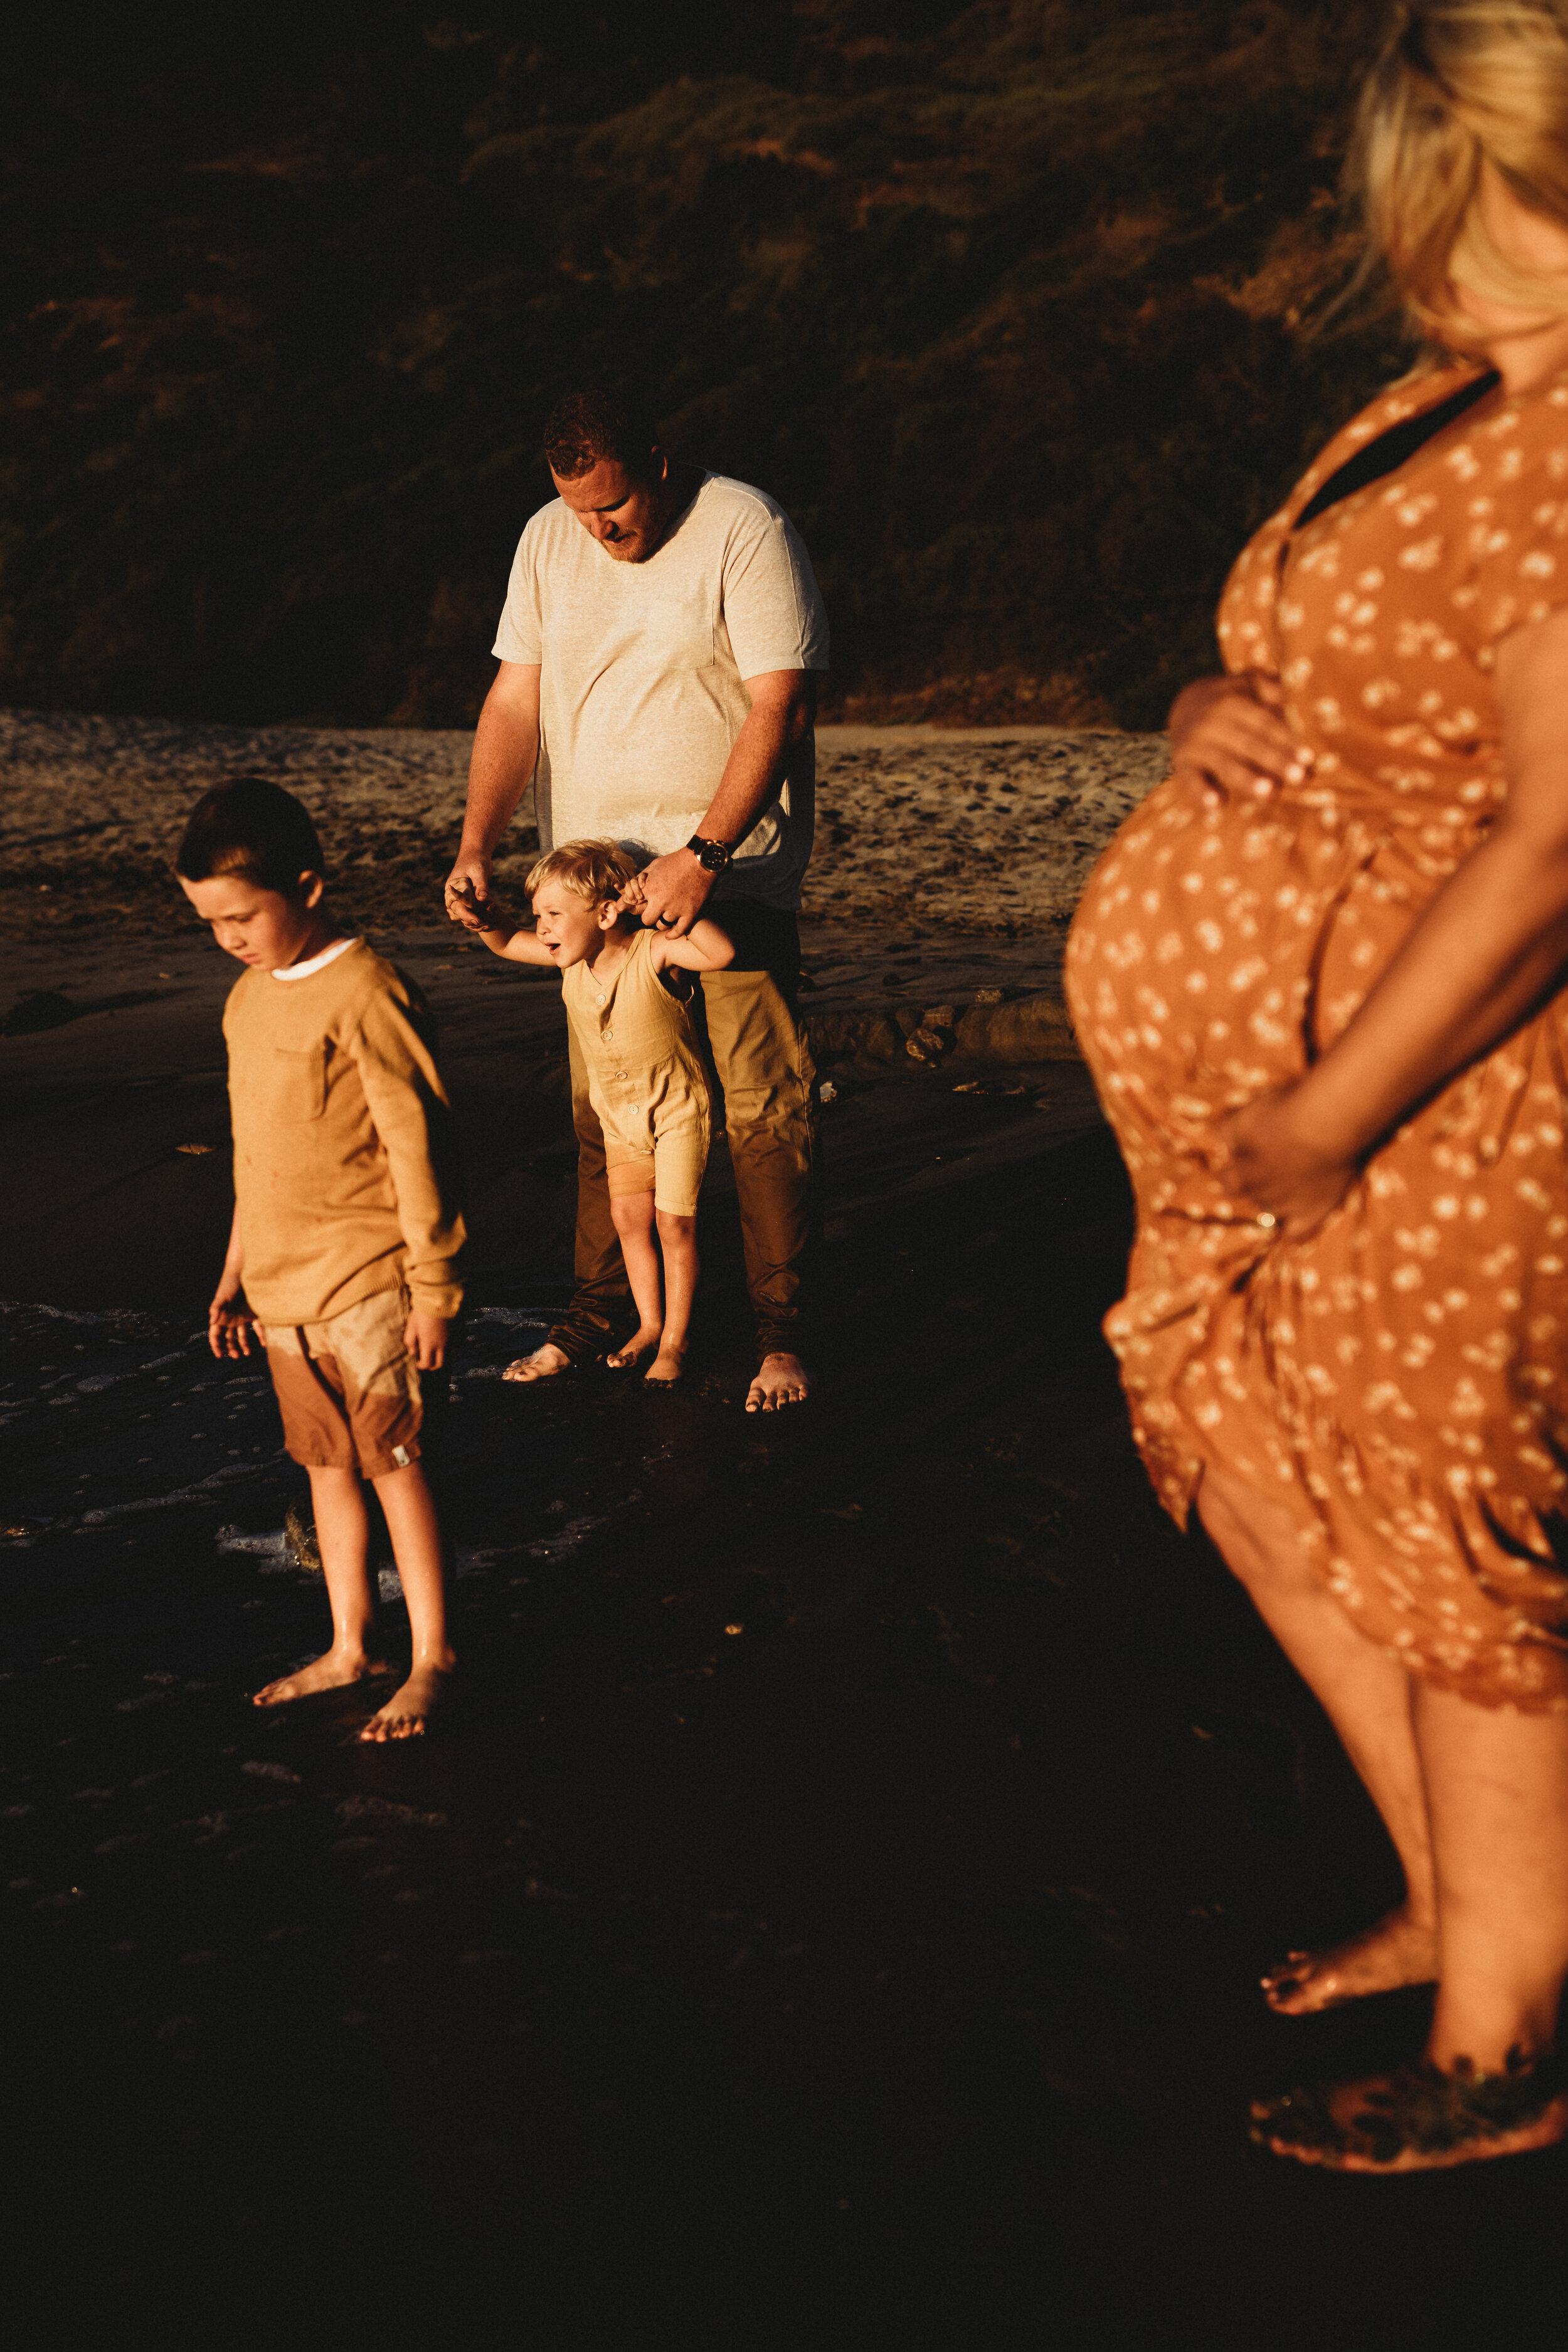 family photographer on beach - Lindsay Petty Photography